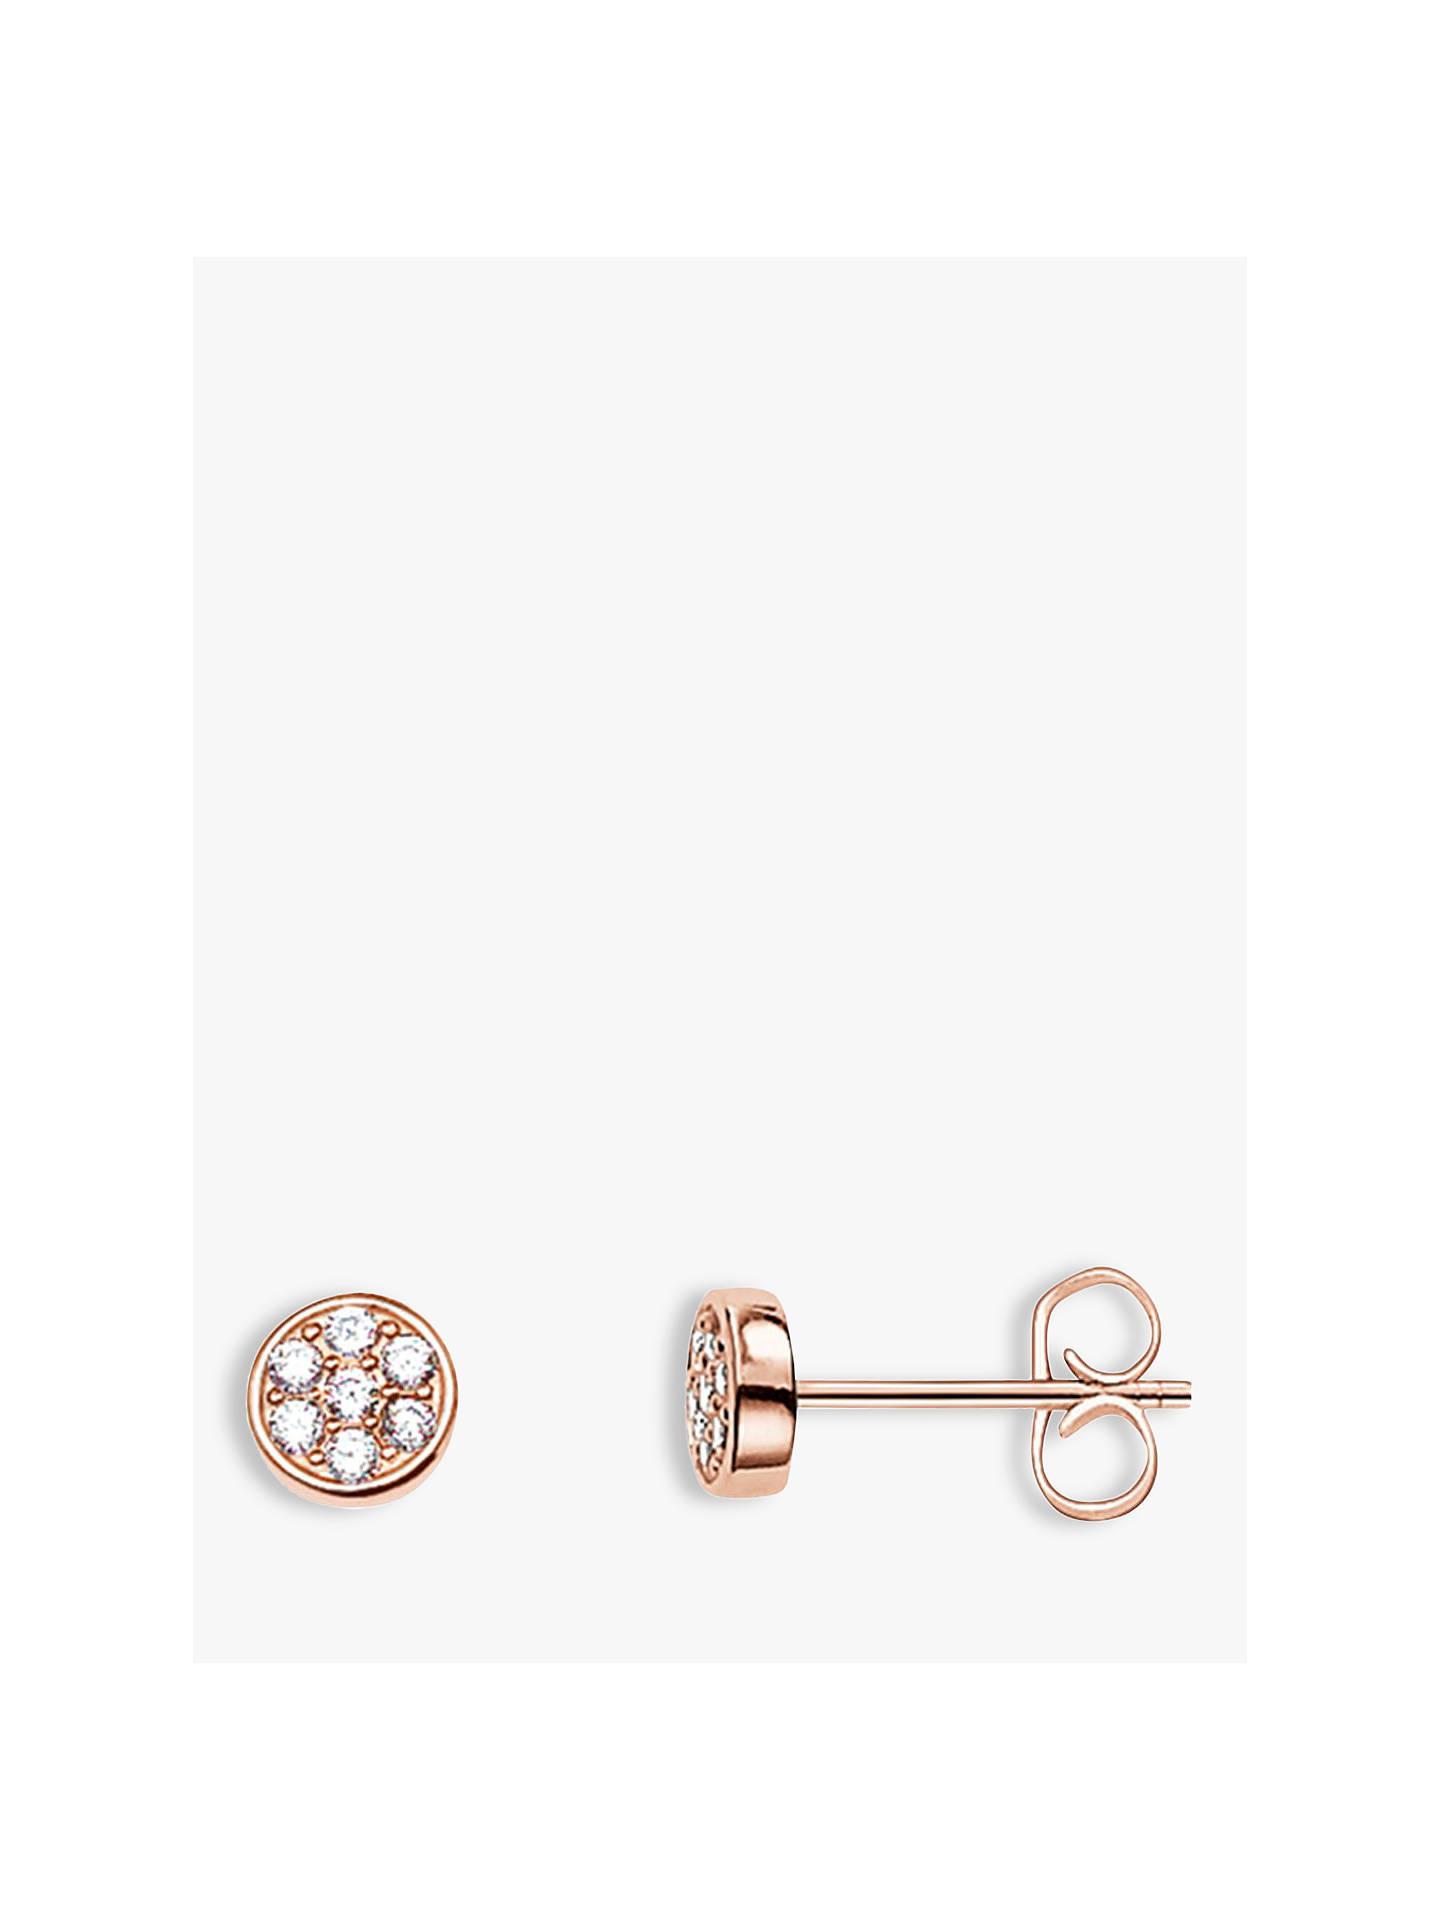 54fd71e7aec0f THOMAS SABO Sparkling Circles Stud Earrings, Rose Gold